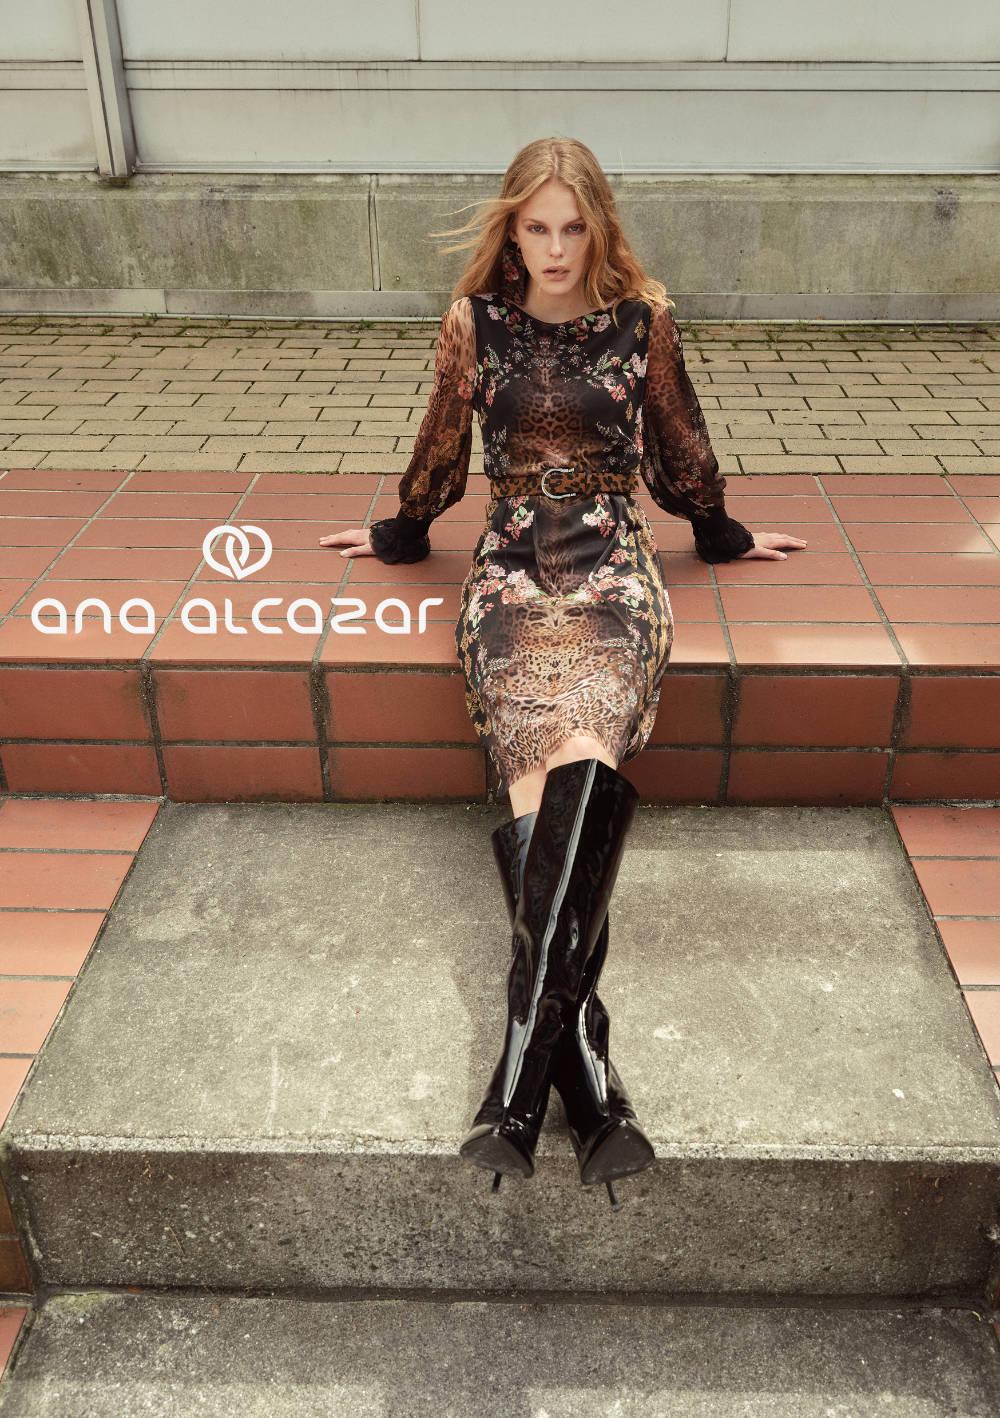 Ana Alcazar Mode bei Veronika Bacher Galeriebild